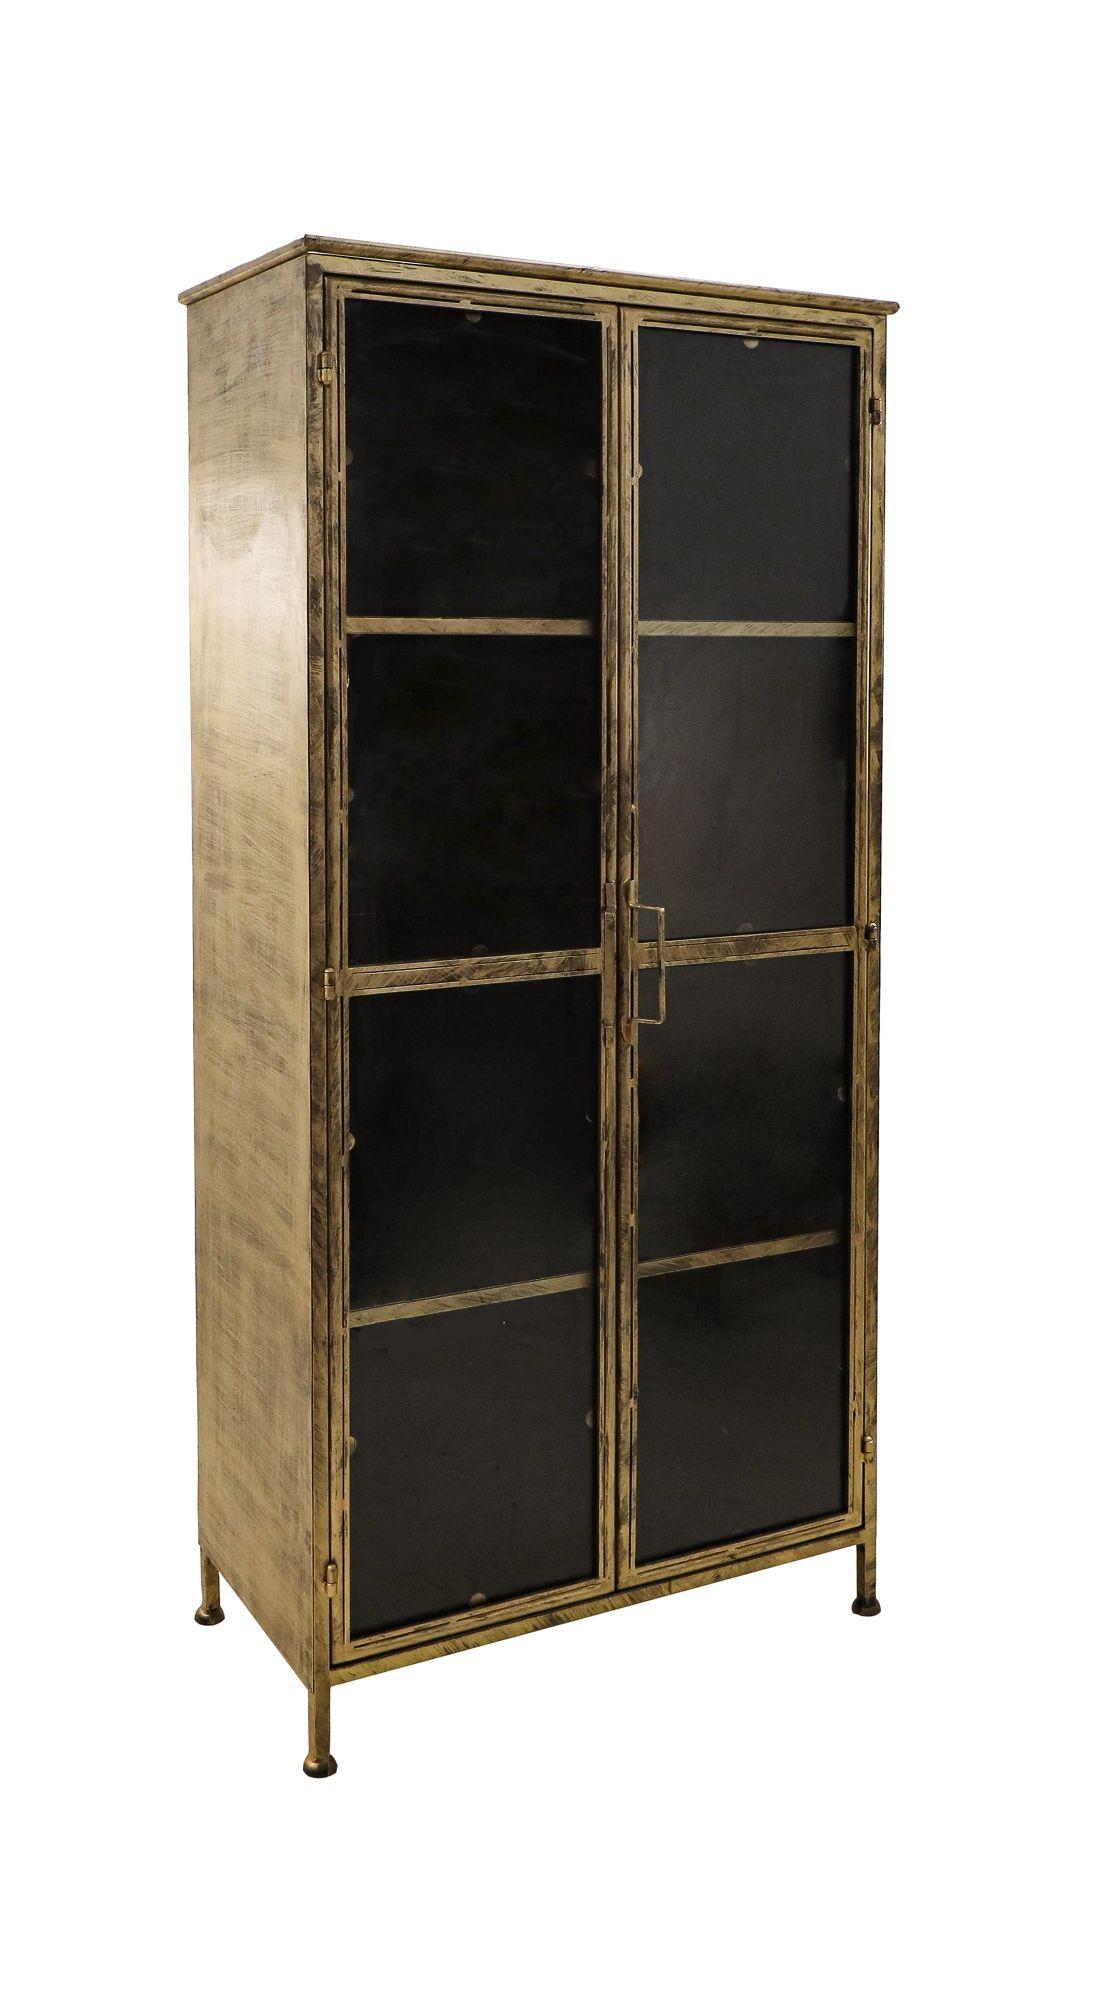 Vitrinekast Fletcher - 80x40x180 - Antique Gold - Metaal/glas